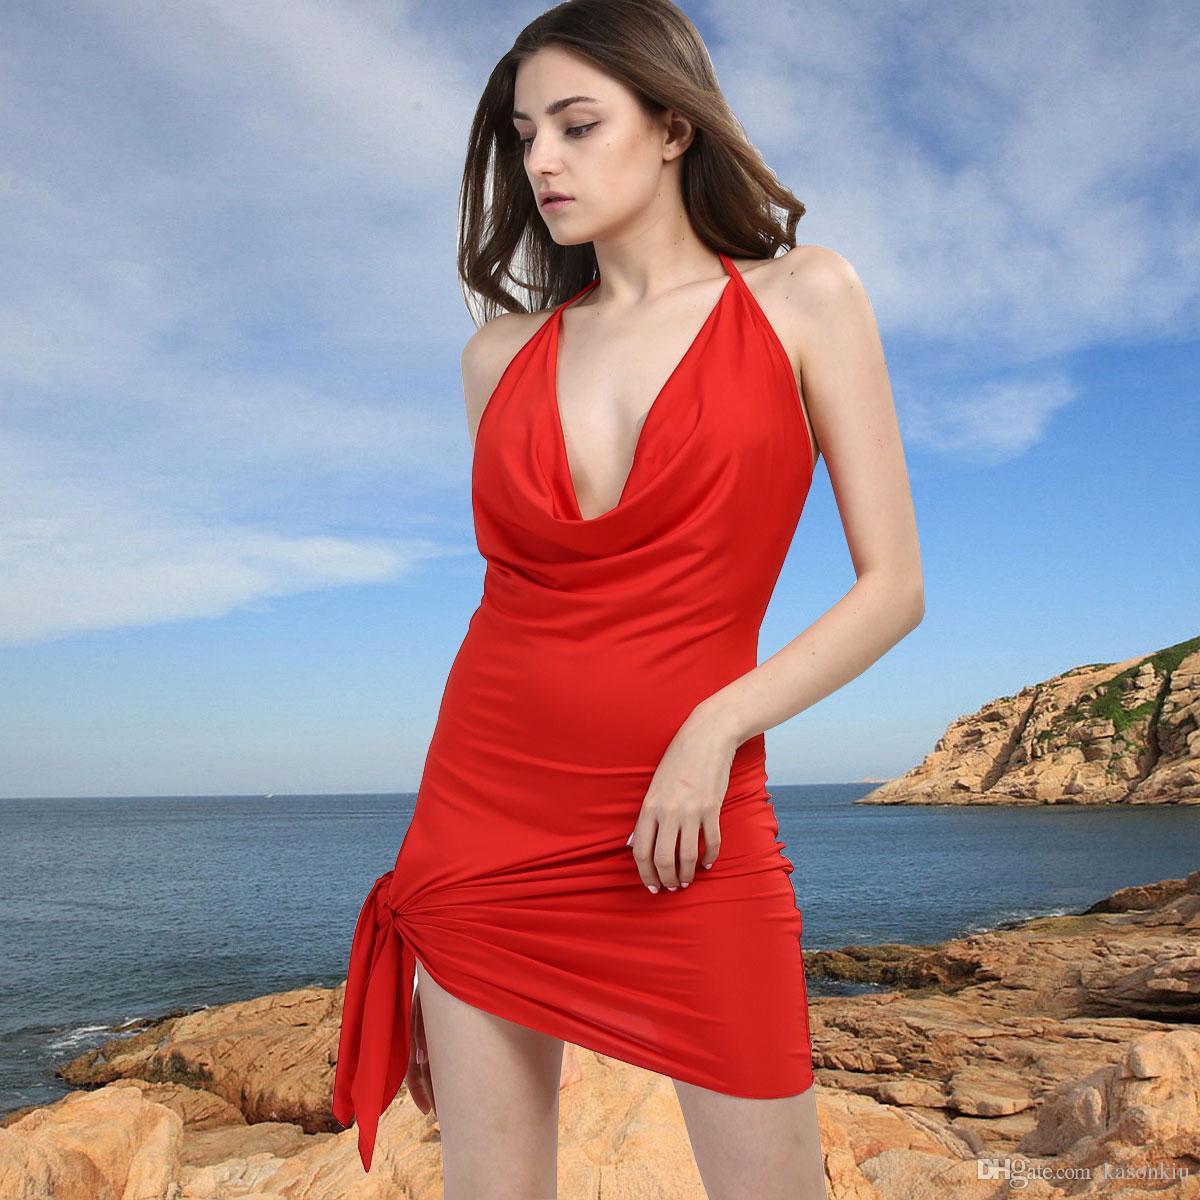 b02ed3e3d4 Sexy Dress 2017 Hot Sexy Dress Women Side Knot Mini Dress Club Wear ...